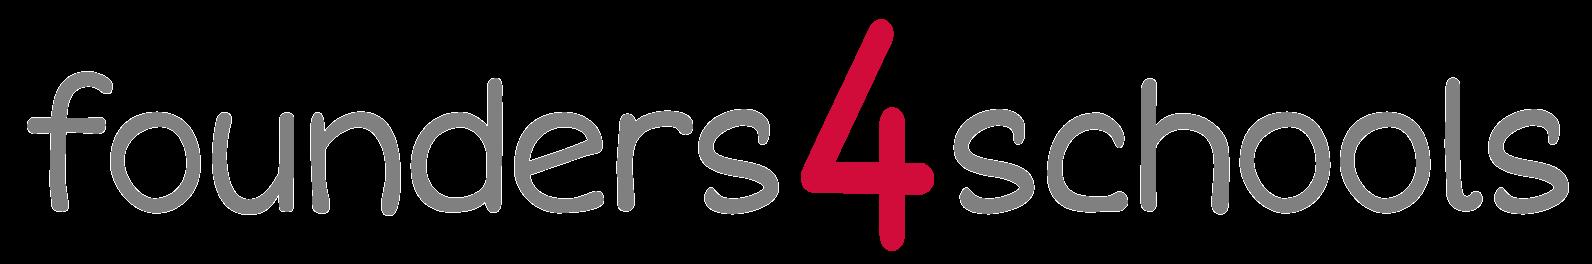 Founders4Schools.png